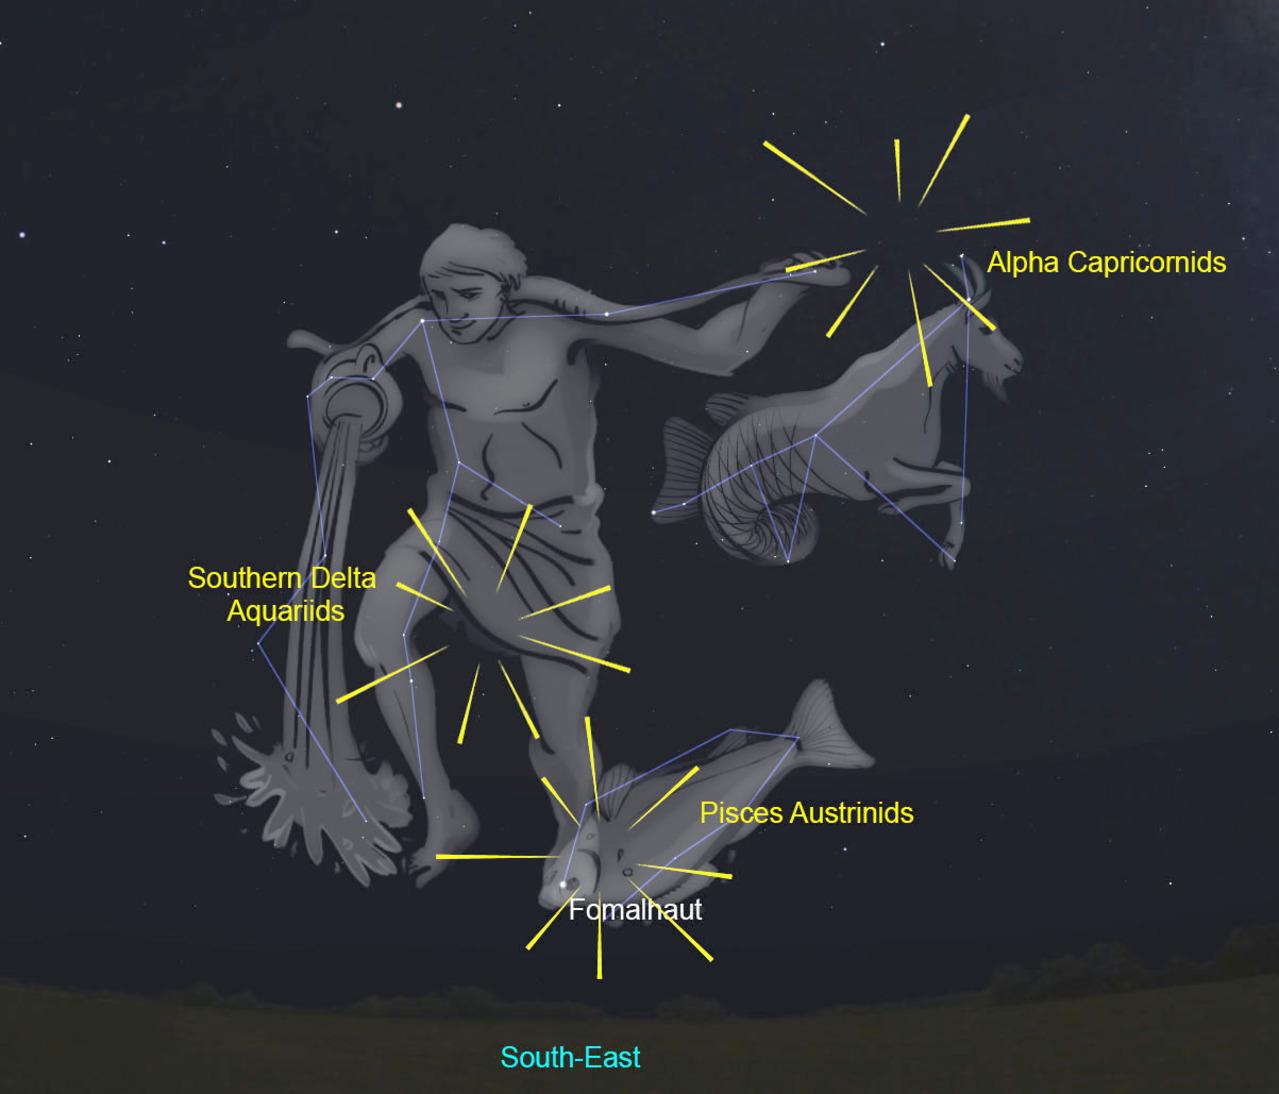 alpha capricornids 2016, alpha capricornid meteor shower 2016, alpha capricornid meteor shower